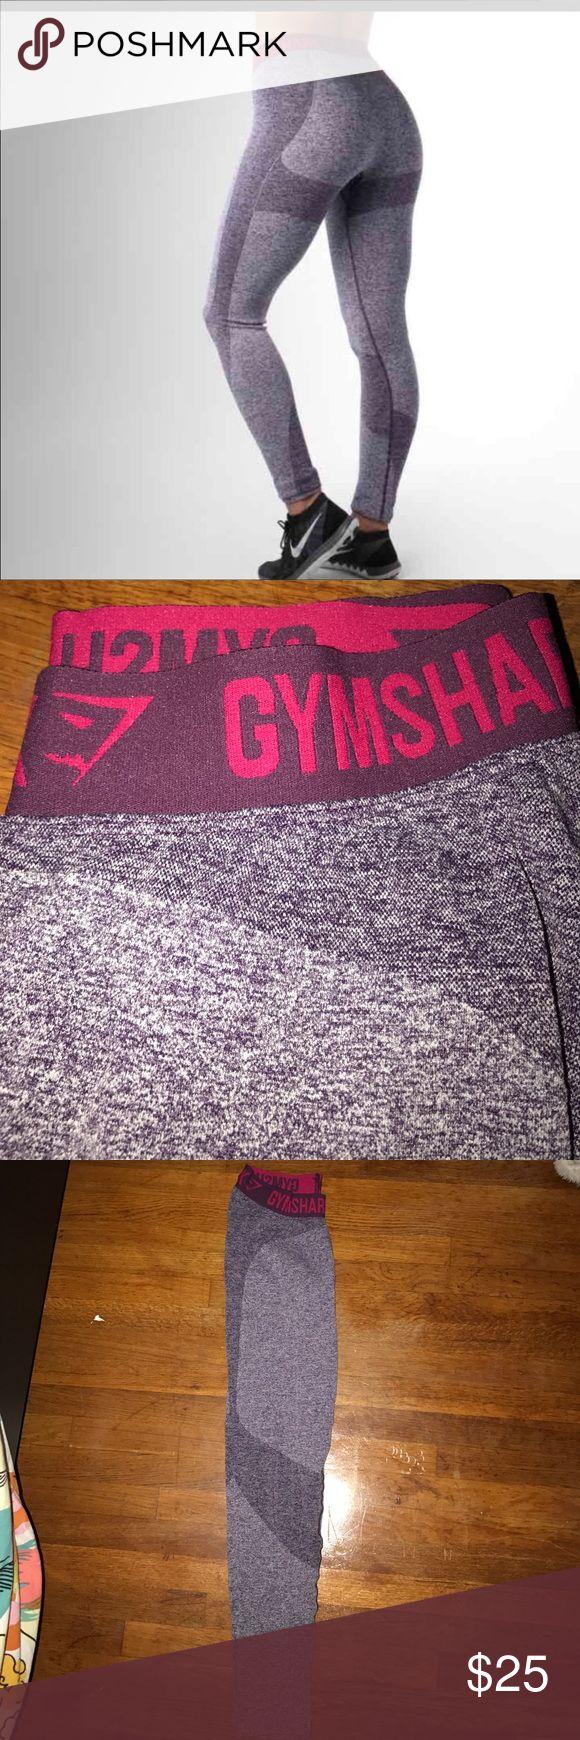 GYMSHARK Gymshark flex leggings in purple. Lightly used. No tears, stretches, or stains. Gymshark Pants Leggings